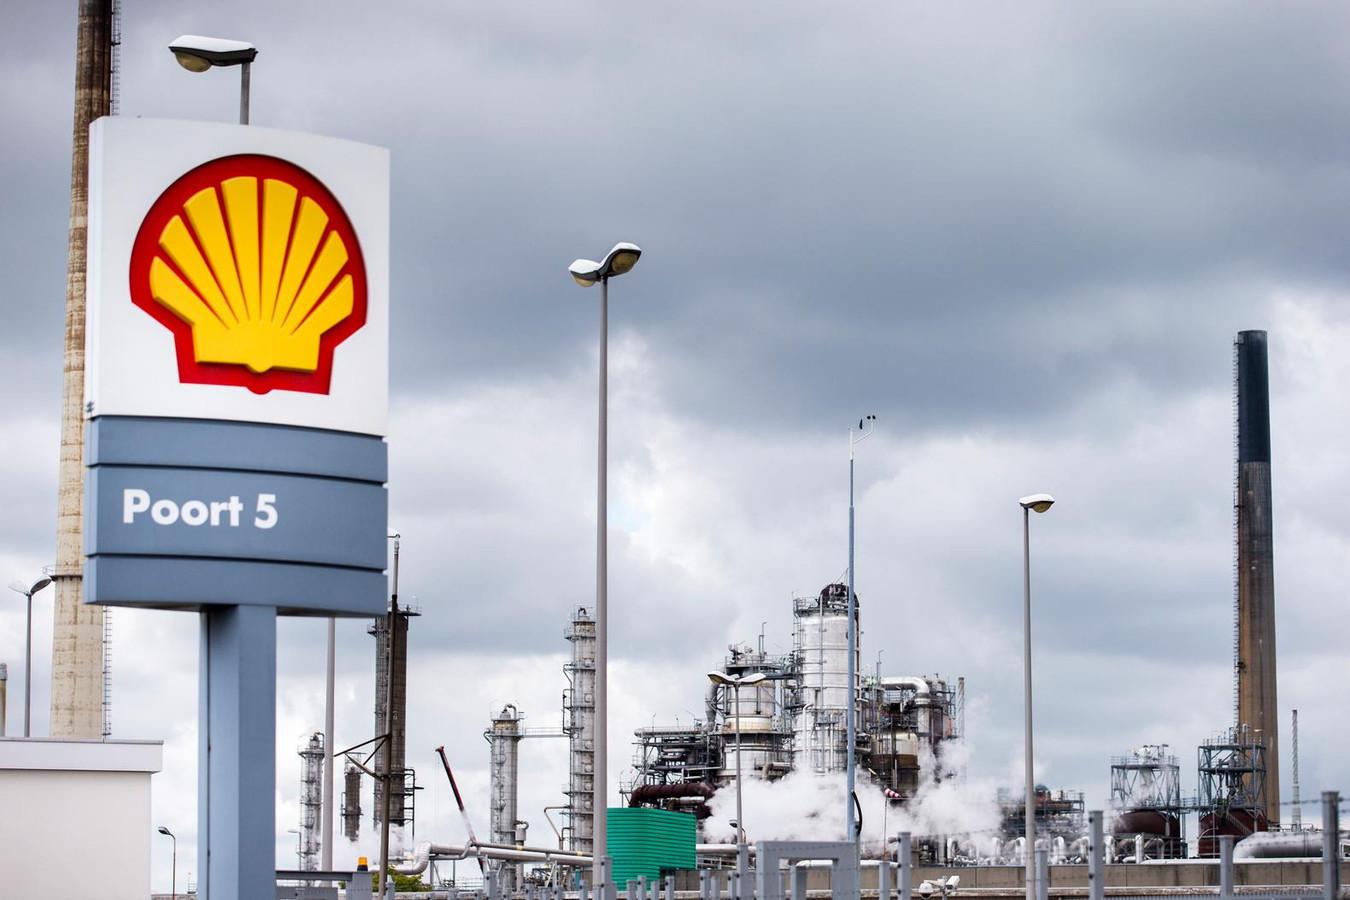 Raffinaderij Shell Pernis, de grootste raffinaderij van Europa en een van de grootste van de wereld.